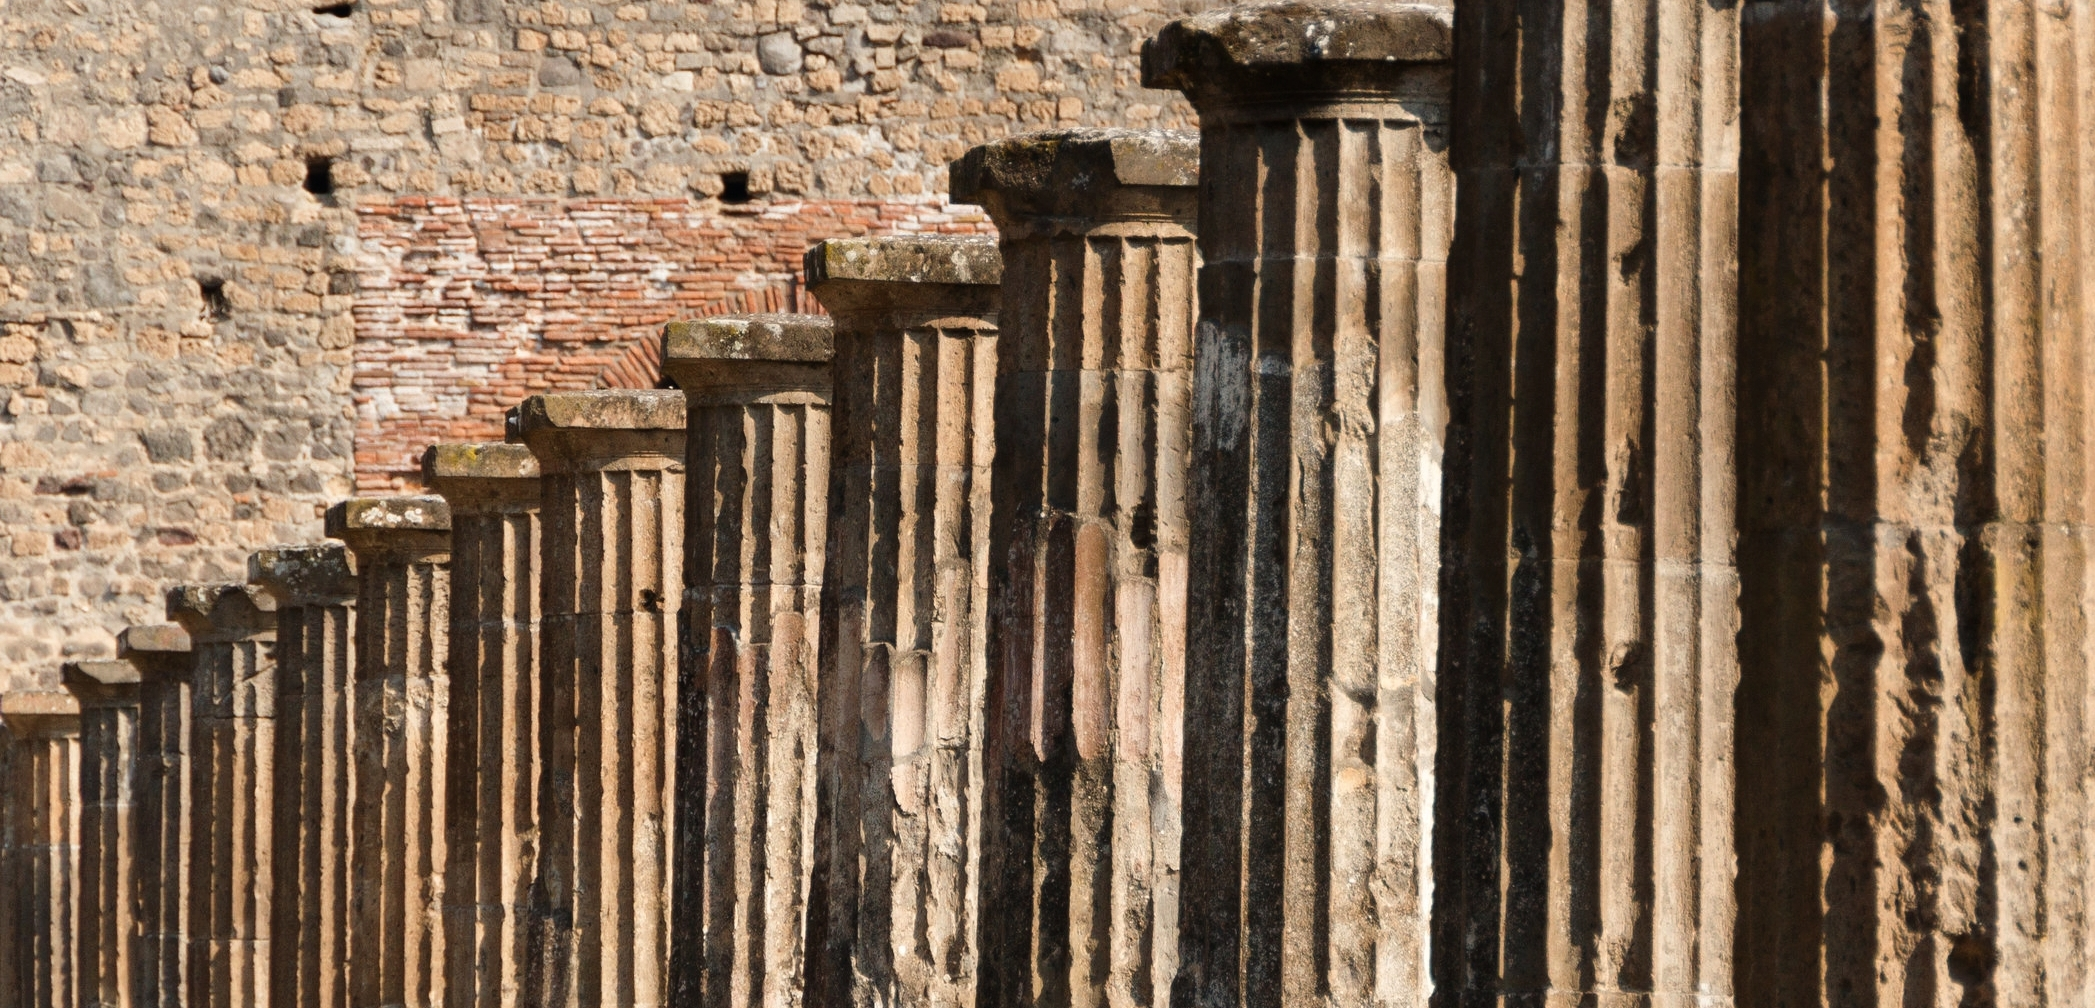 Columns_Pompeii_Italy.jpg